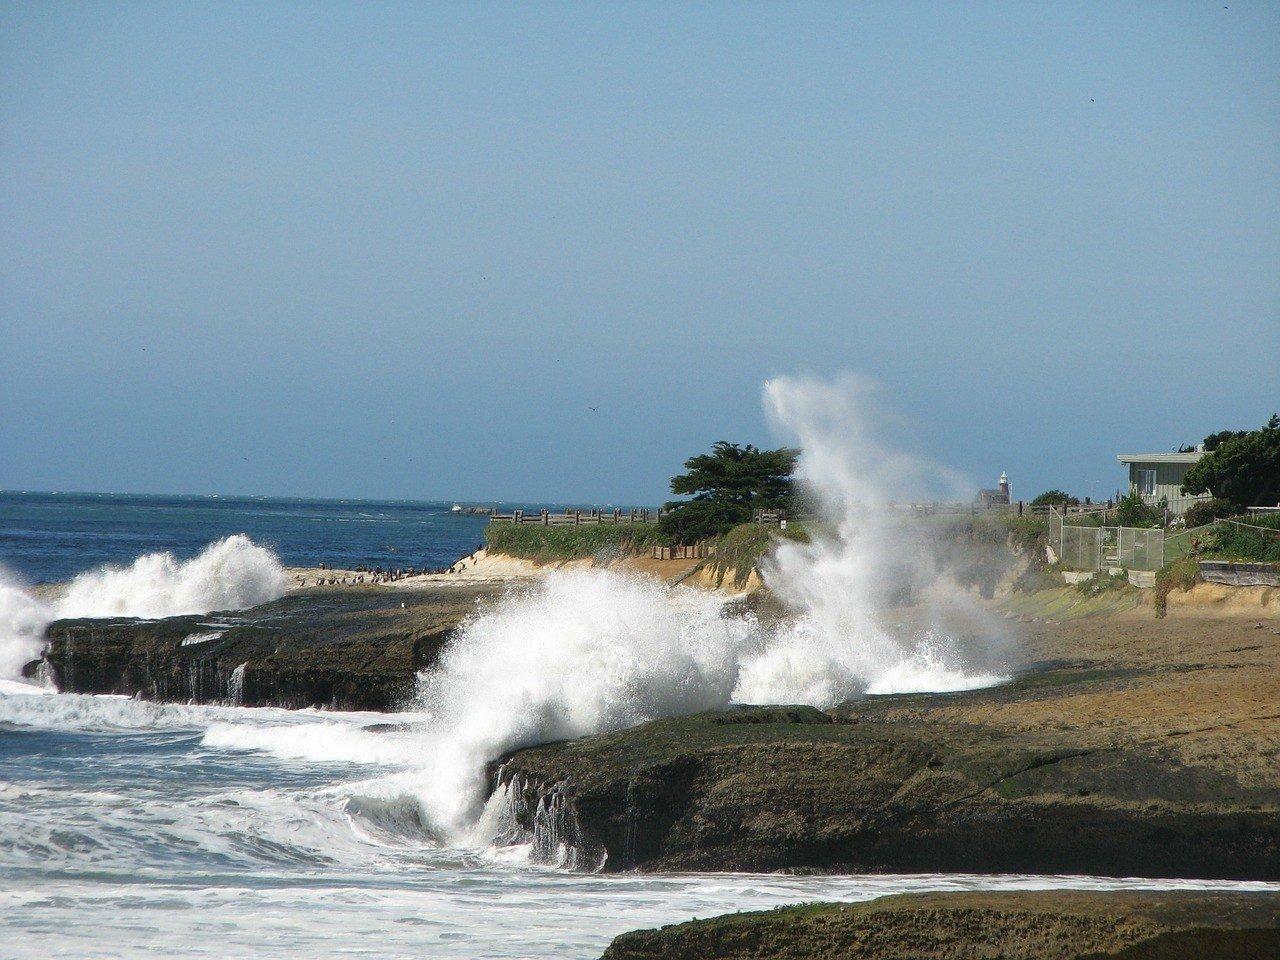 Santa Cruz Weekend Travel FAQs